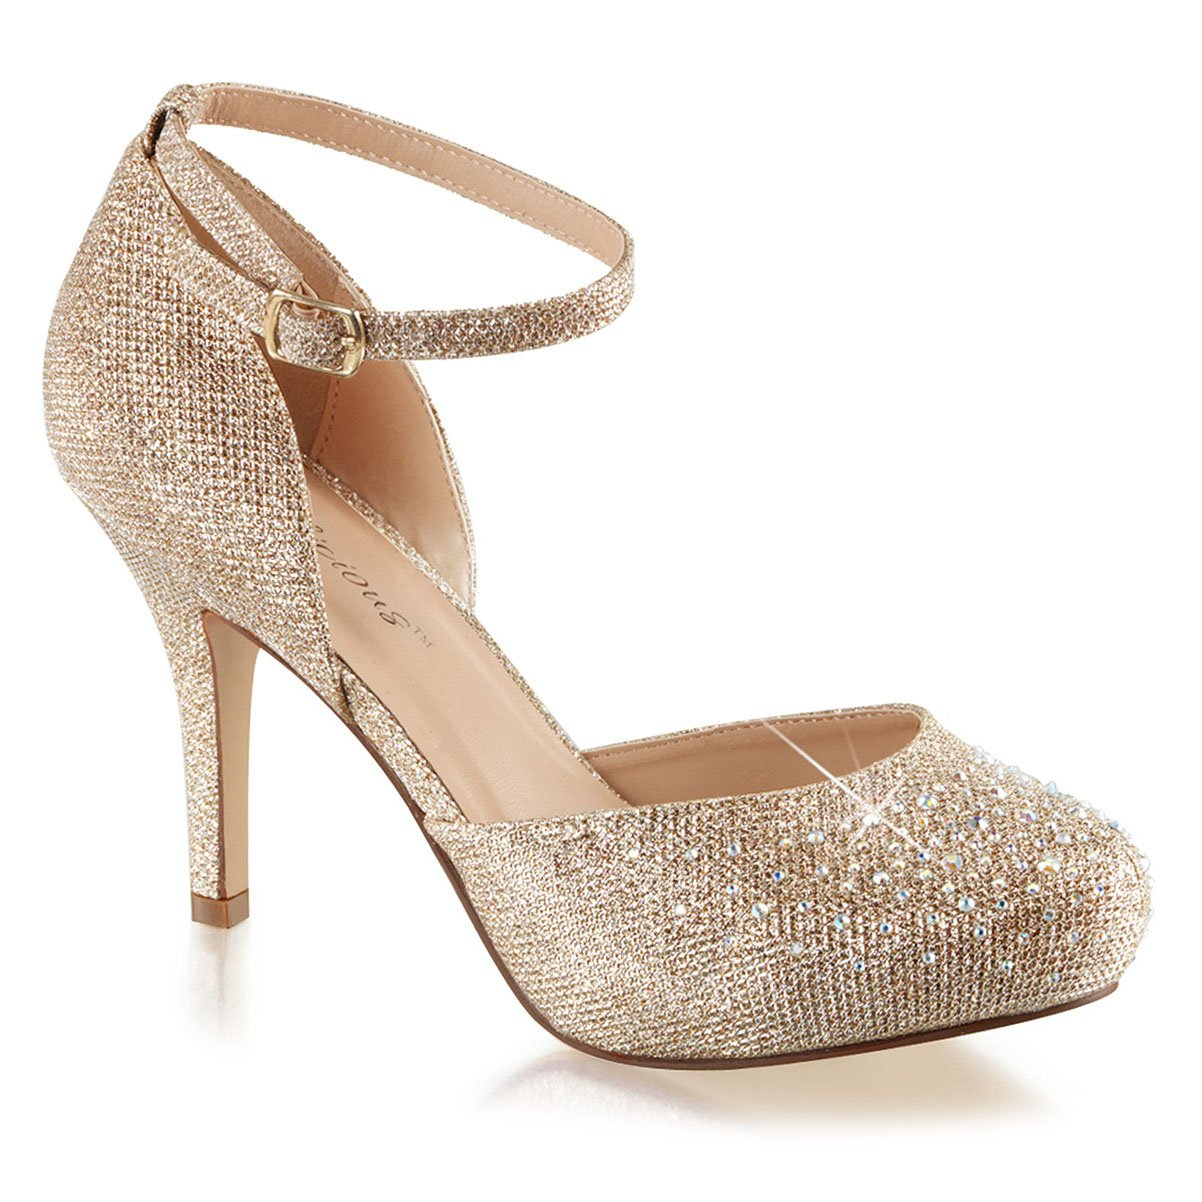 b39675ecb Amazon.com | Summitfashions Womens Nude Color Shoes Glitter Pumps Ankle  Strap Silver Rhinestone 3 1/2 Inch | Pumps